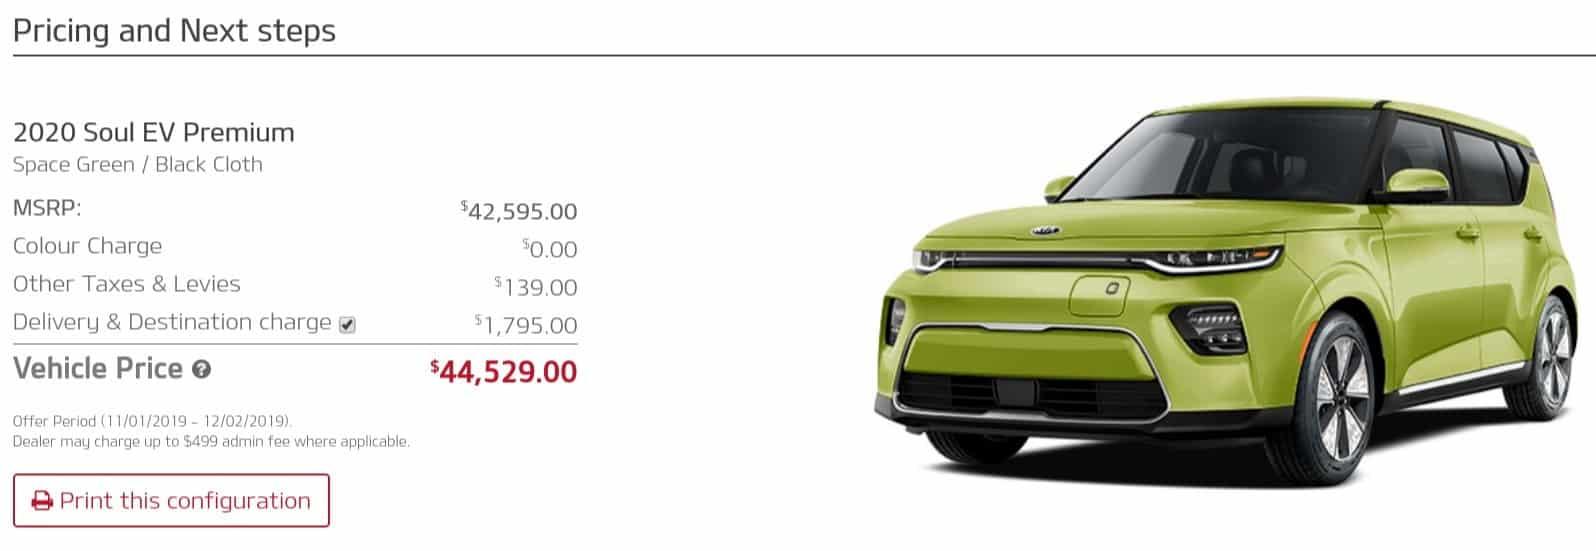 2020 Kia Soul EV is a great electric car deal